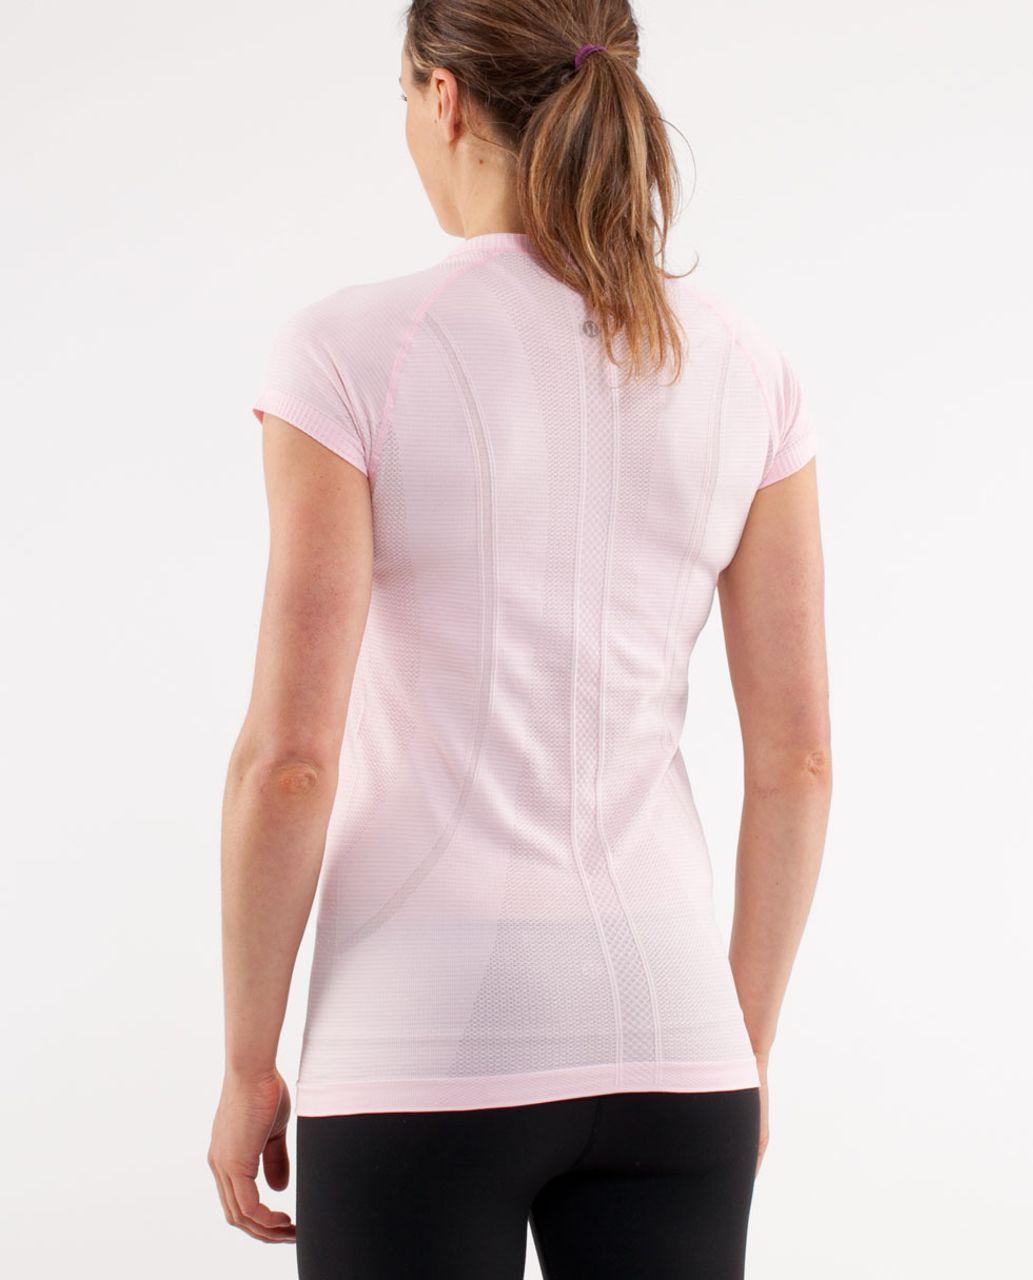 Lululemon Run:  Swiftly Tech Short Sleeve - Pig Pink